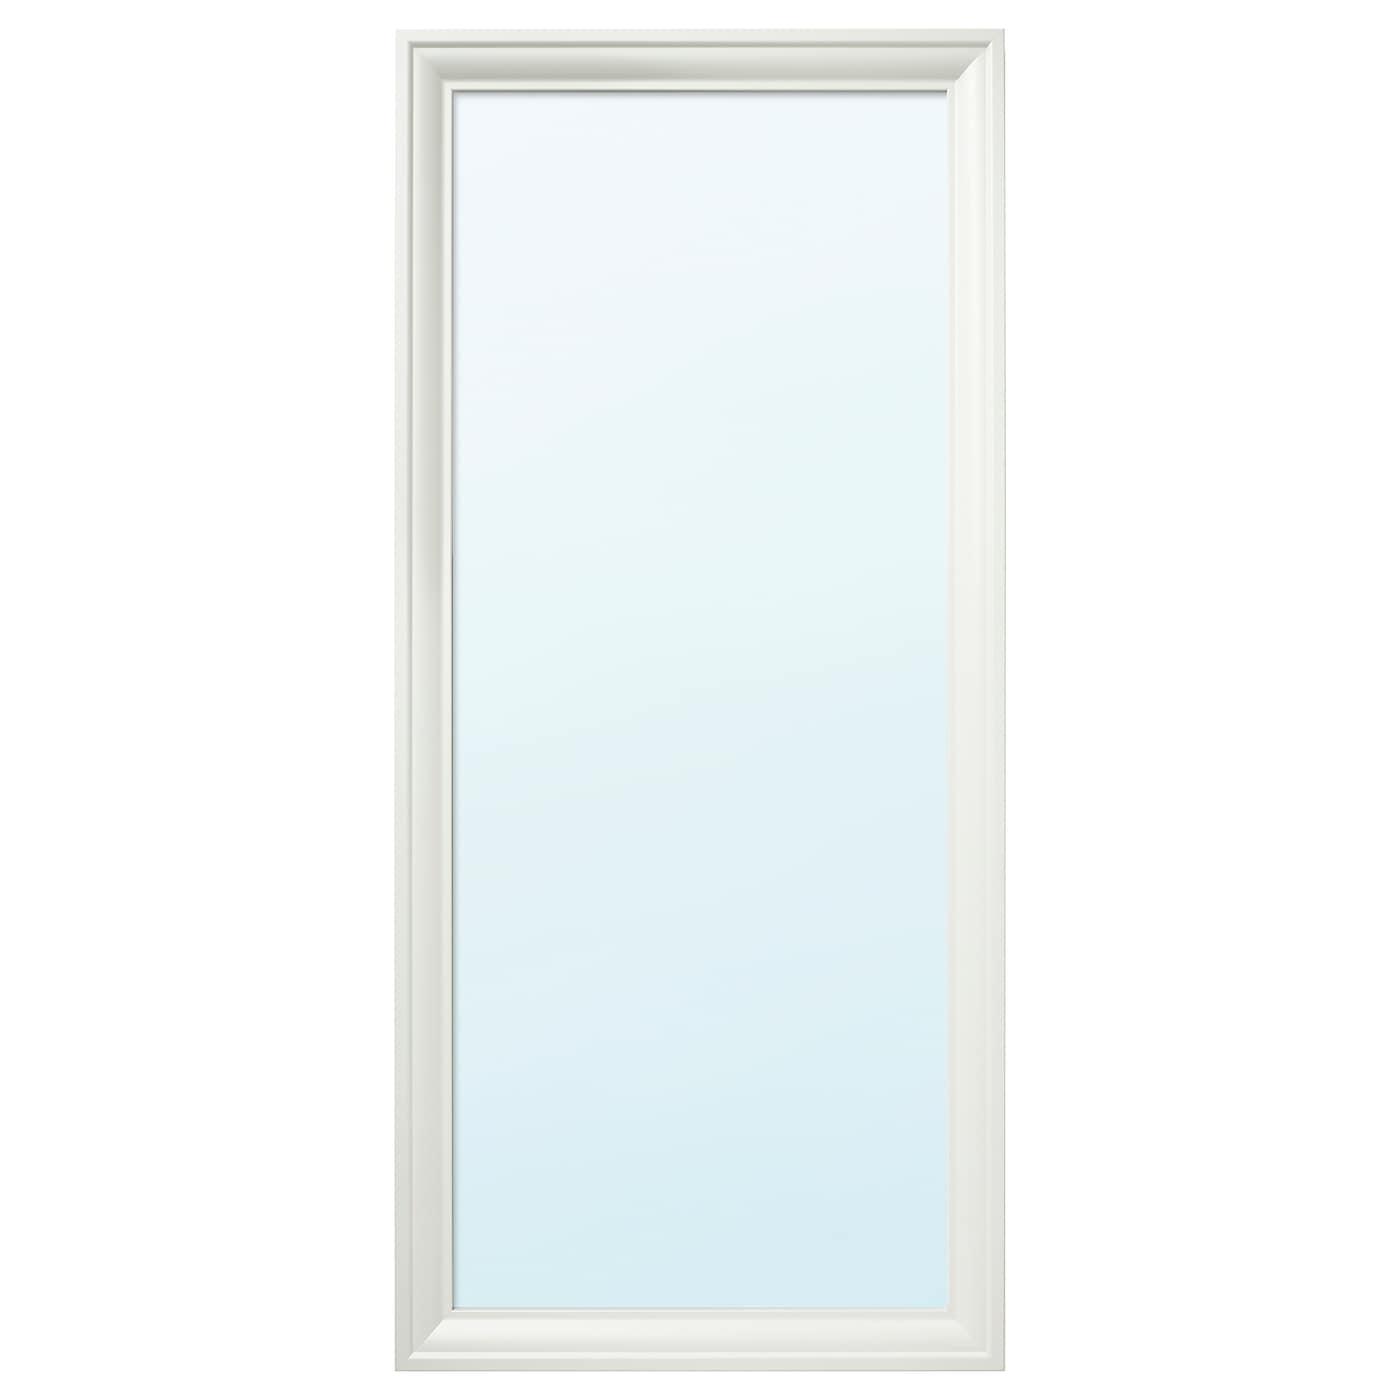 "TOFTBYN Mirror - white 100 10/10x10 "" (10x1010 cm)"